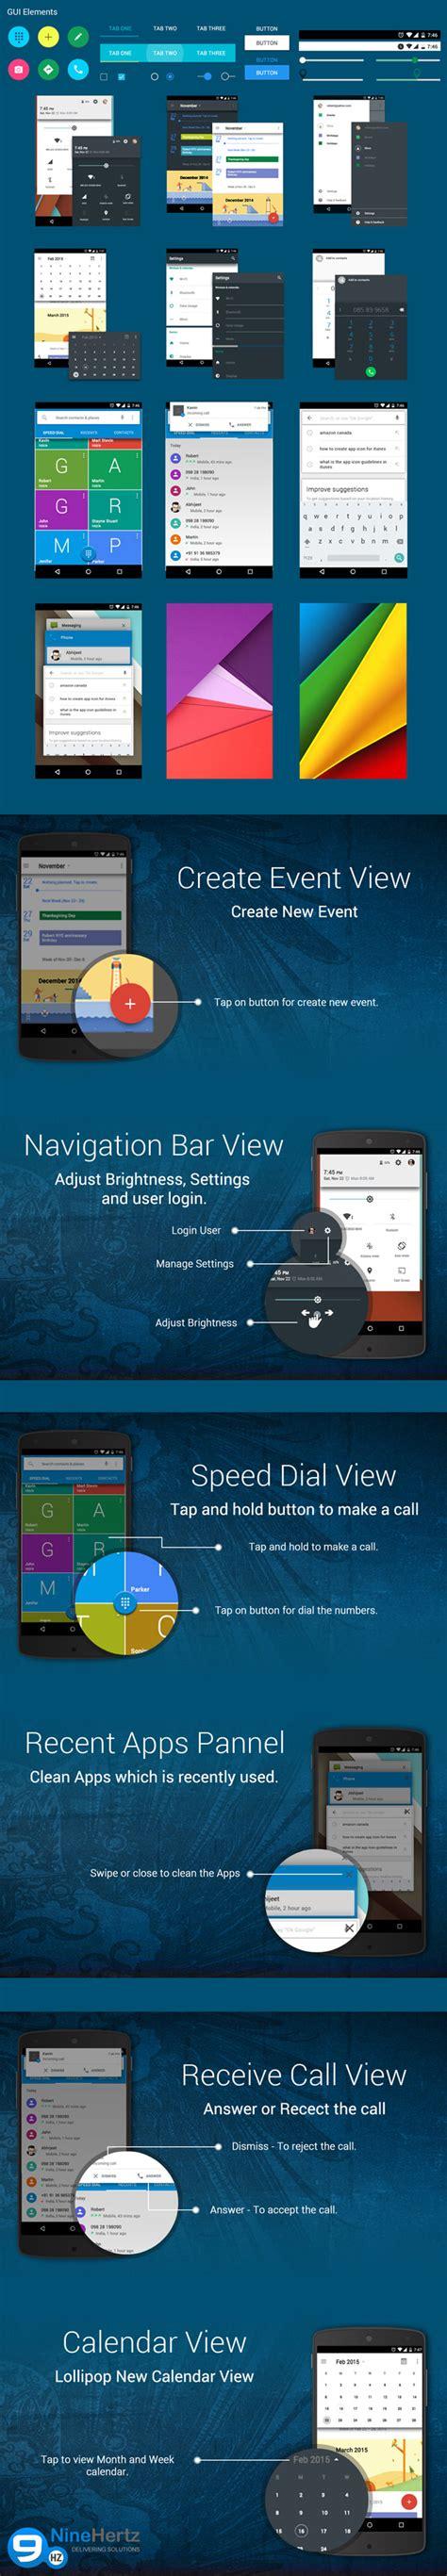 material design html ui kit free android material design ui kit psd free download